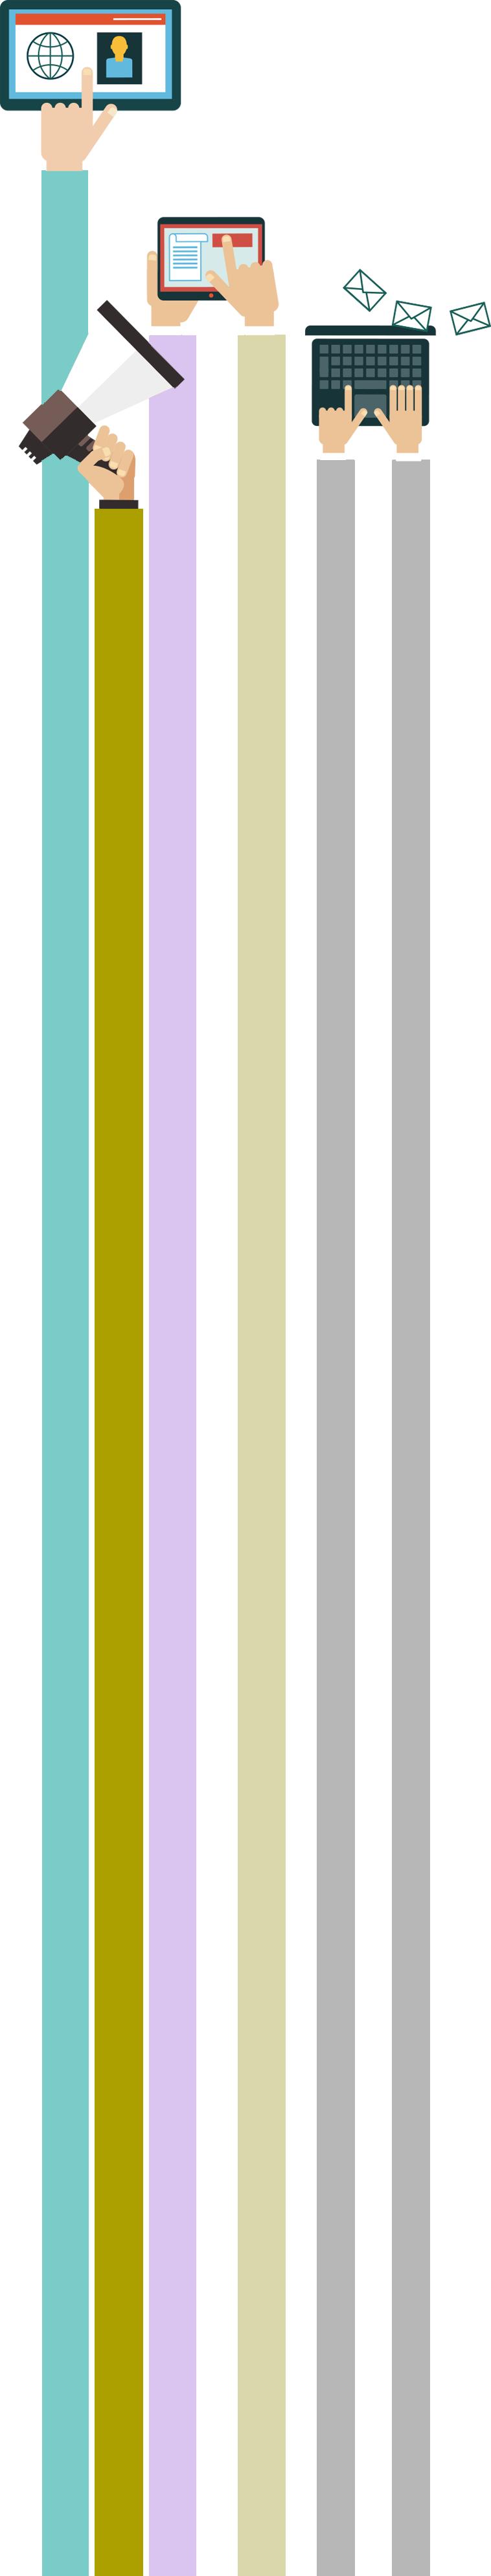 decorative sidebar image